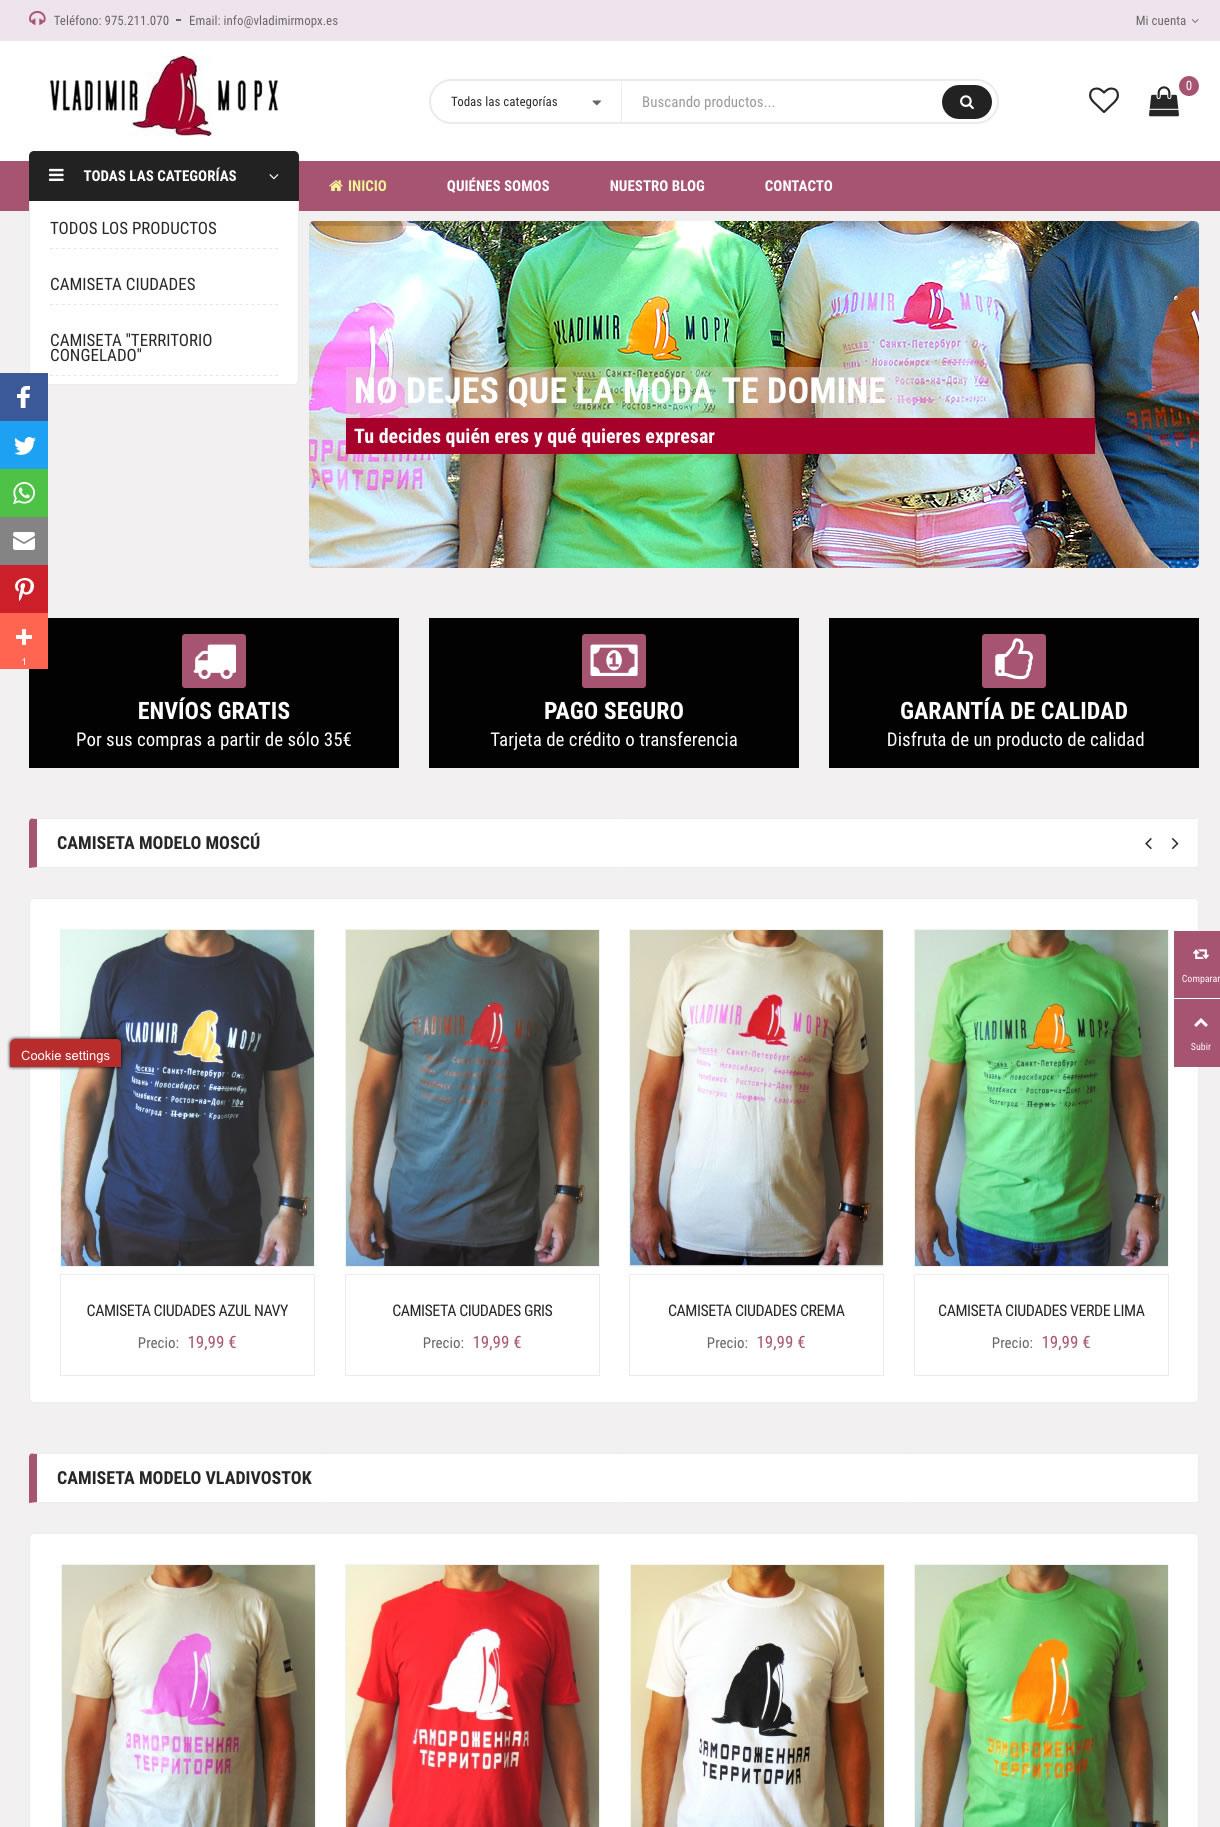 VLADIMIRMOPX (Tienda online de ropa)